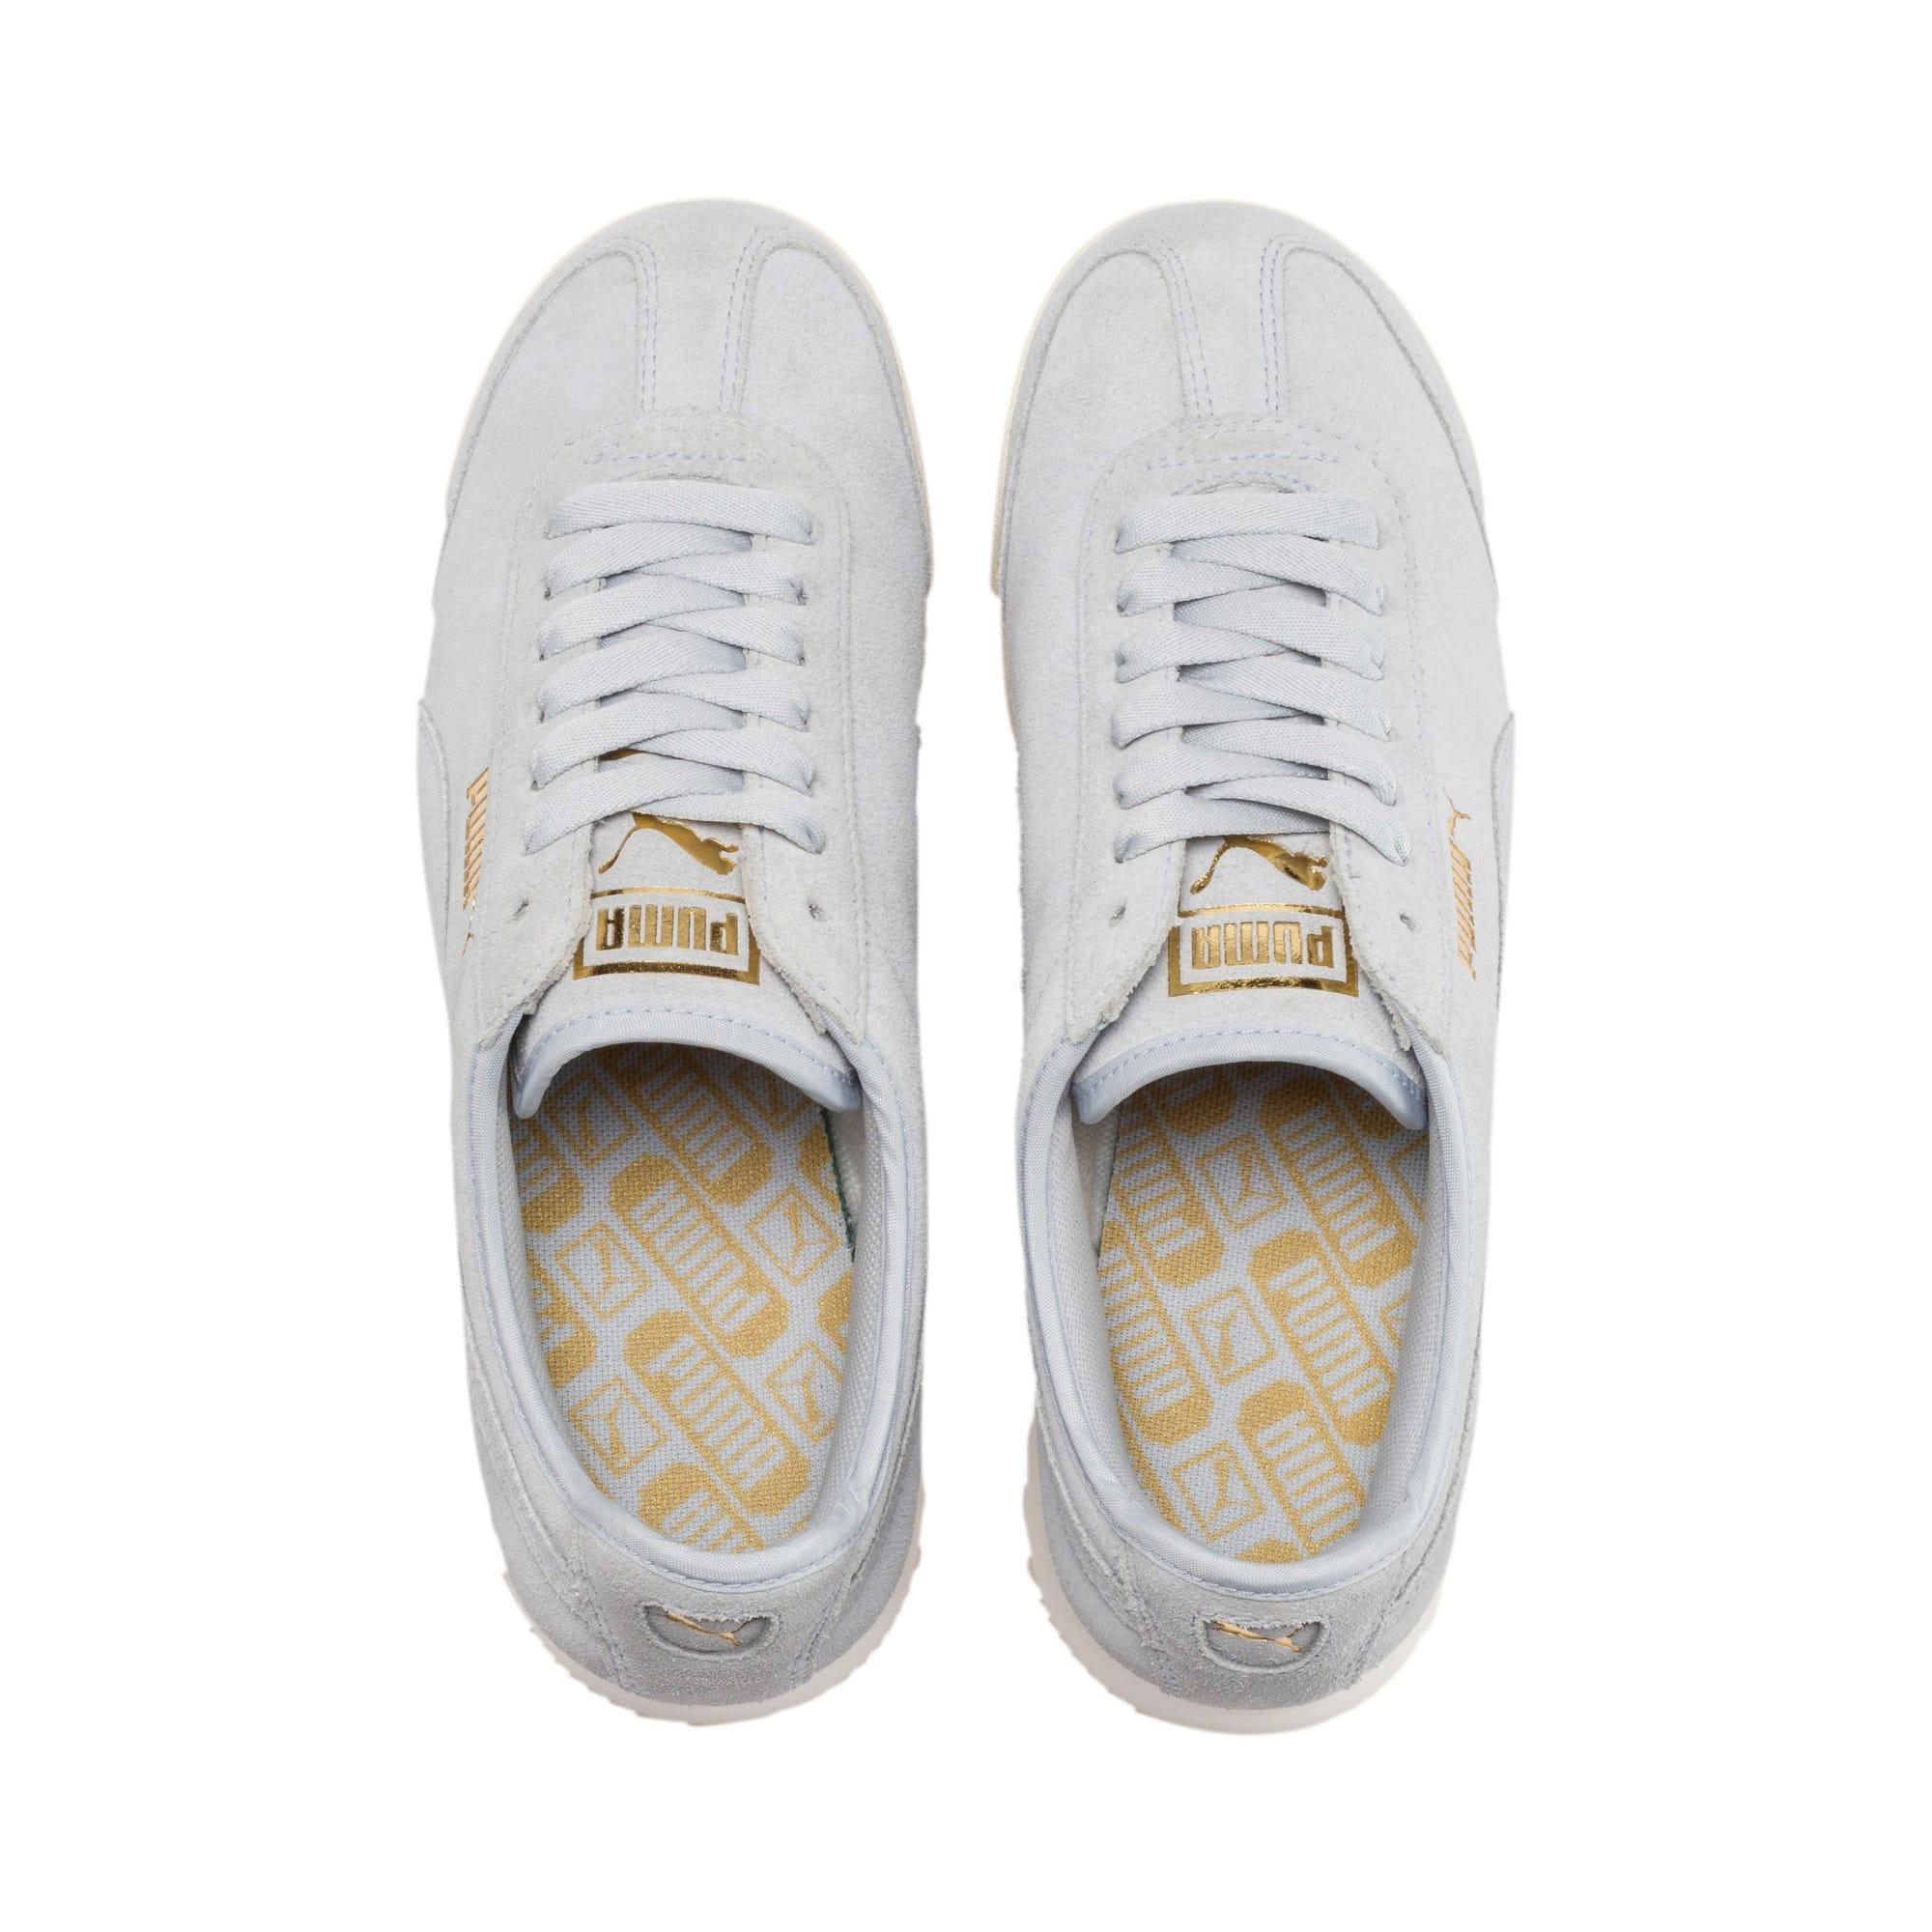 Thumbnail 7 of Roma Amor Suede Women's Sneakers, Heather-Puma Team Gold, medium